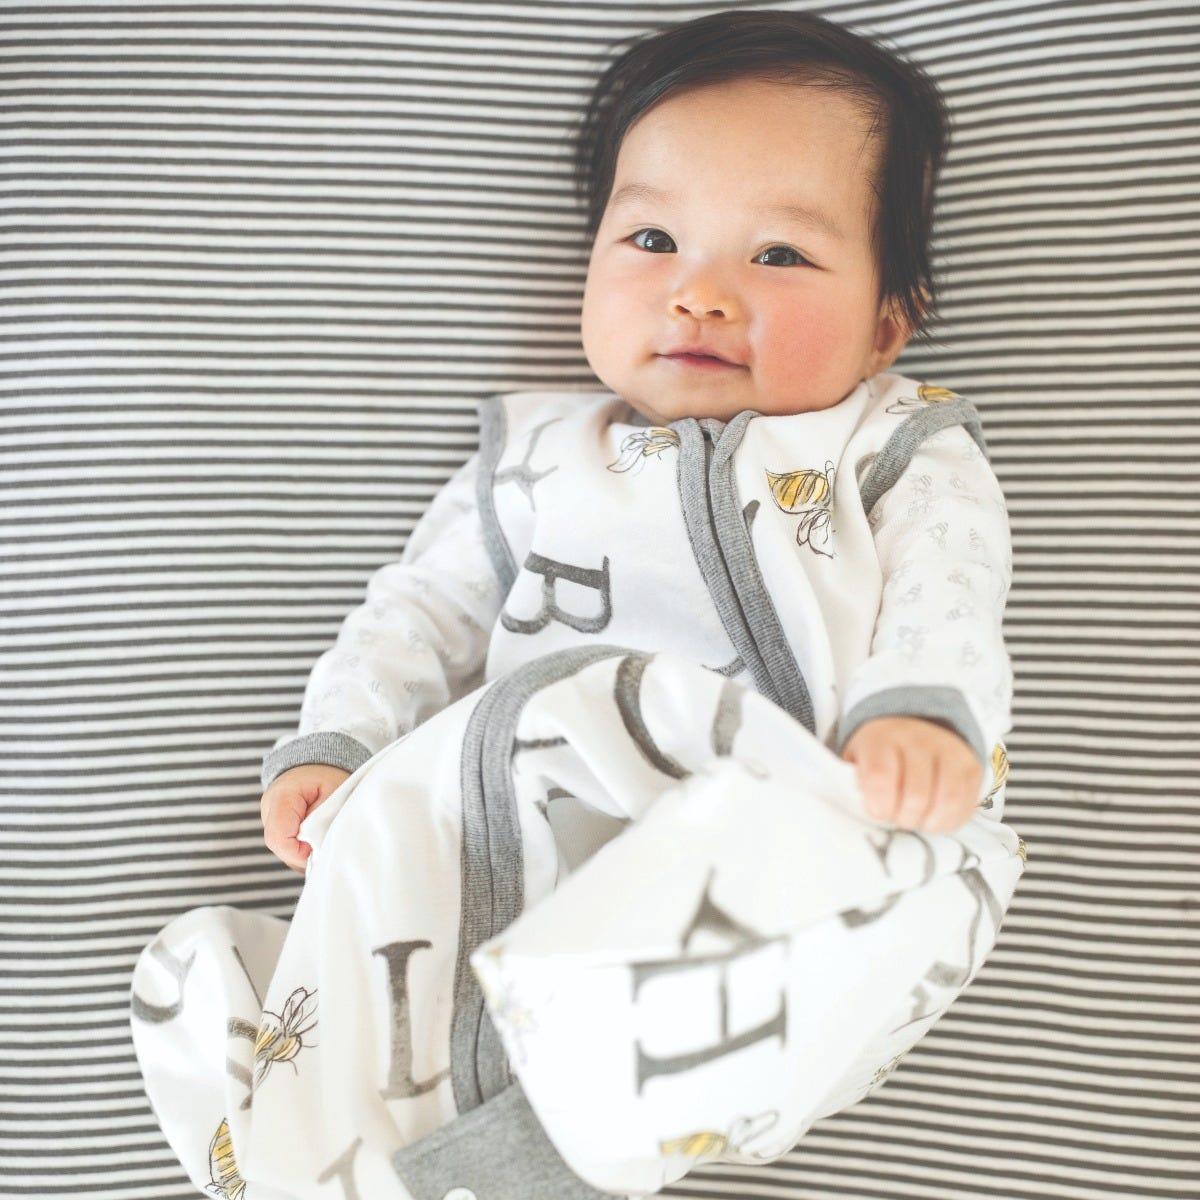 Burts Bees Baby 100/% Organic Cotton Swaddle Transition Sleeping Bag Beekeeper Wearable Blanket